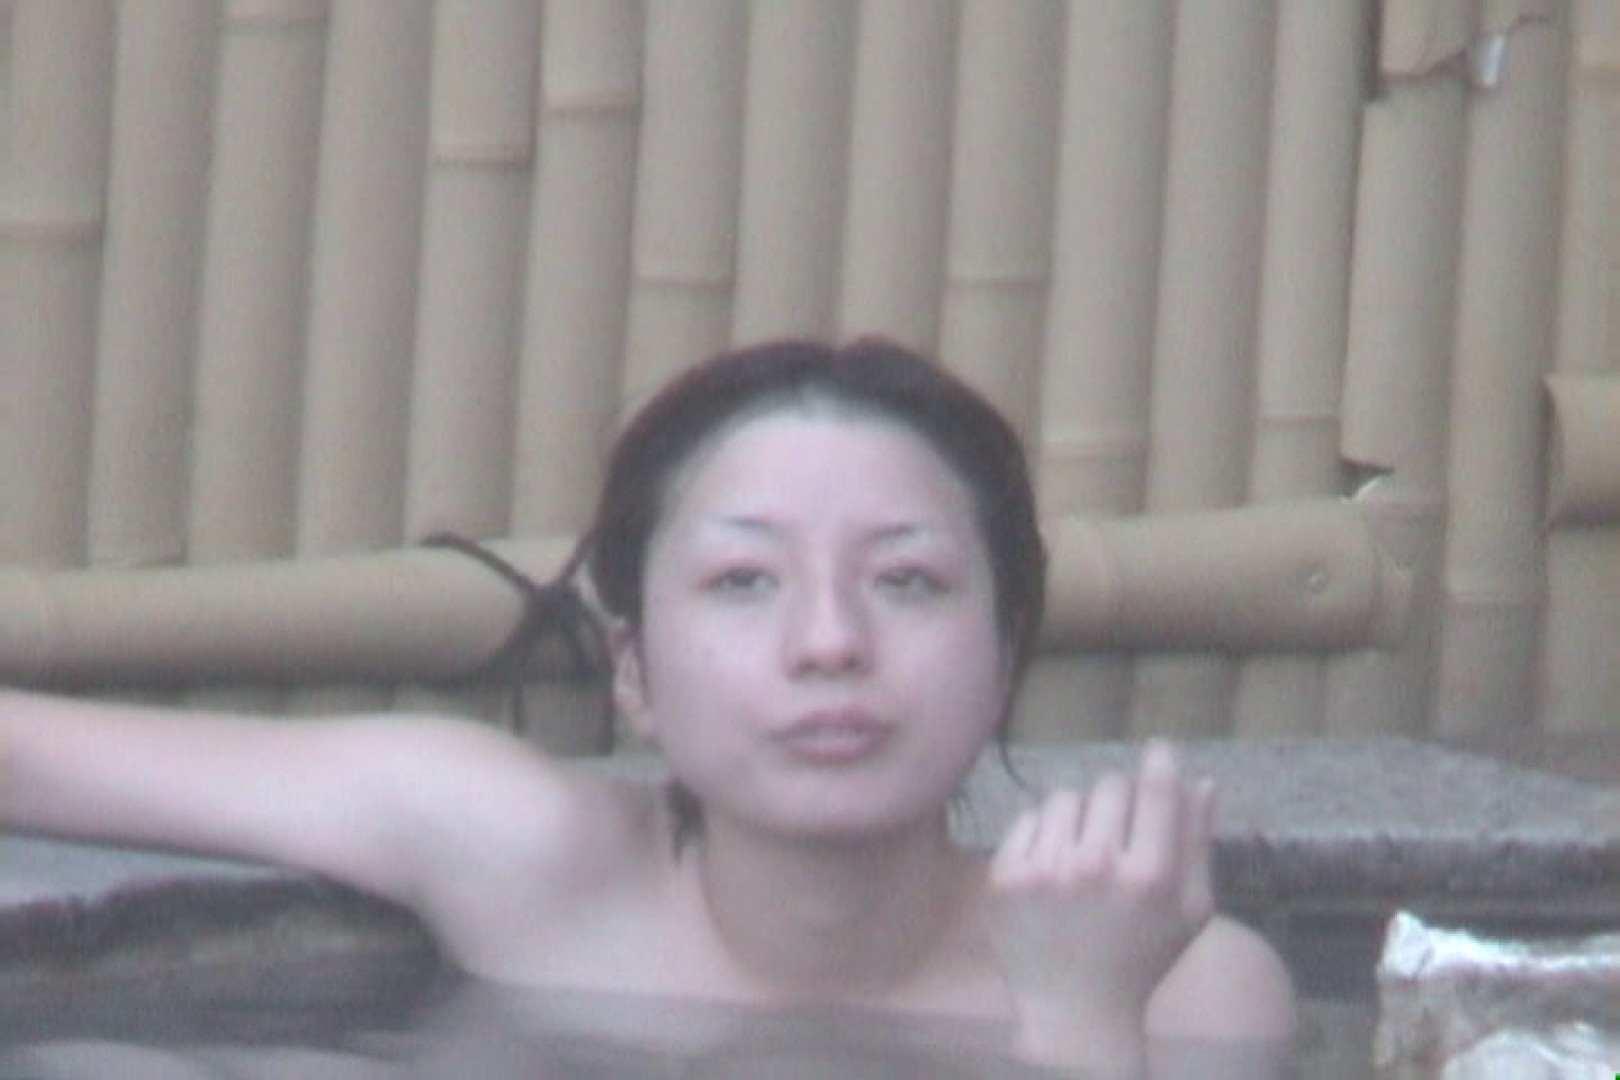 Aquaな露天風呂Vol.608 露天風呂突入 | 盗撮師作品  95pic 13